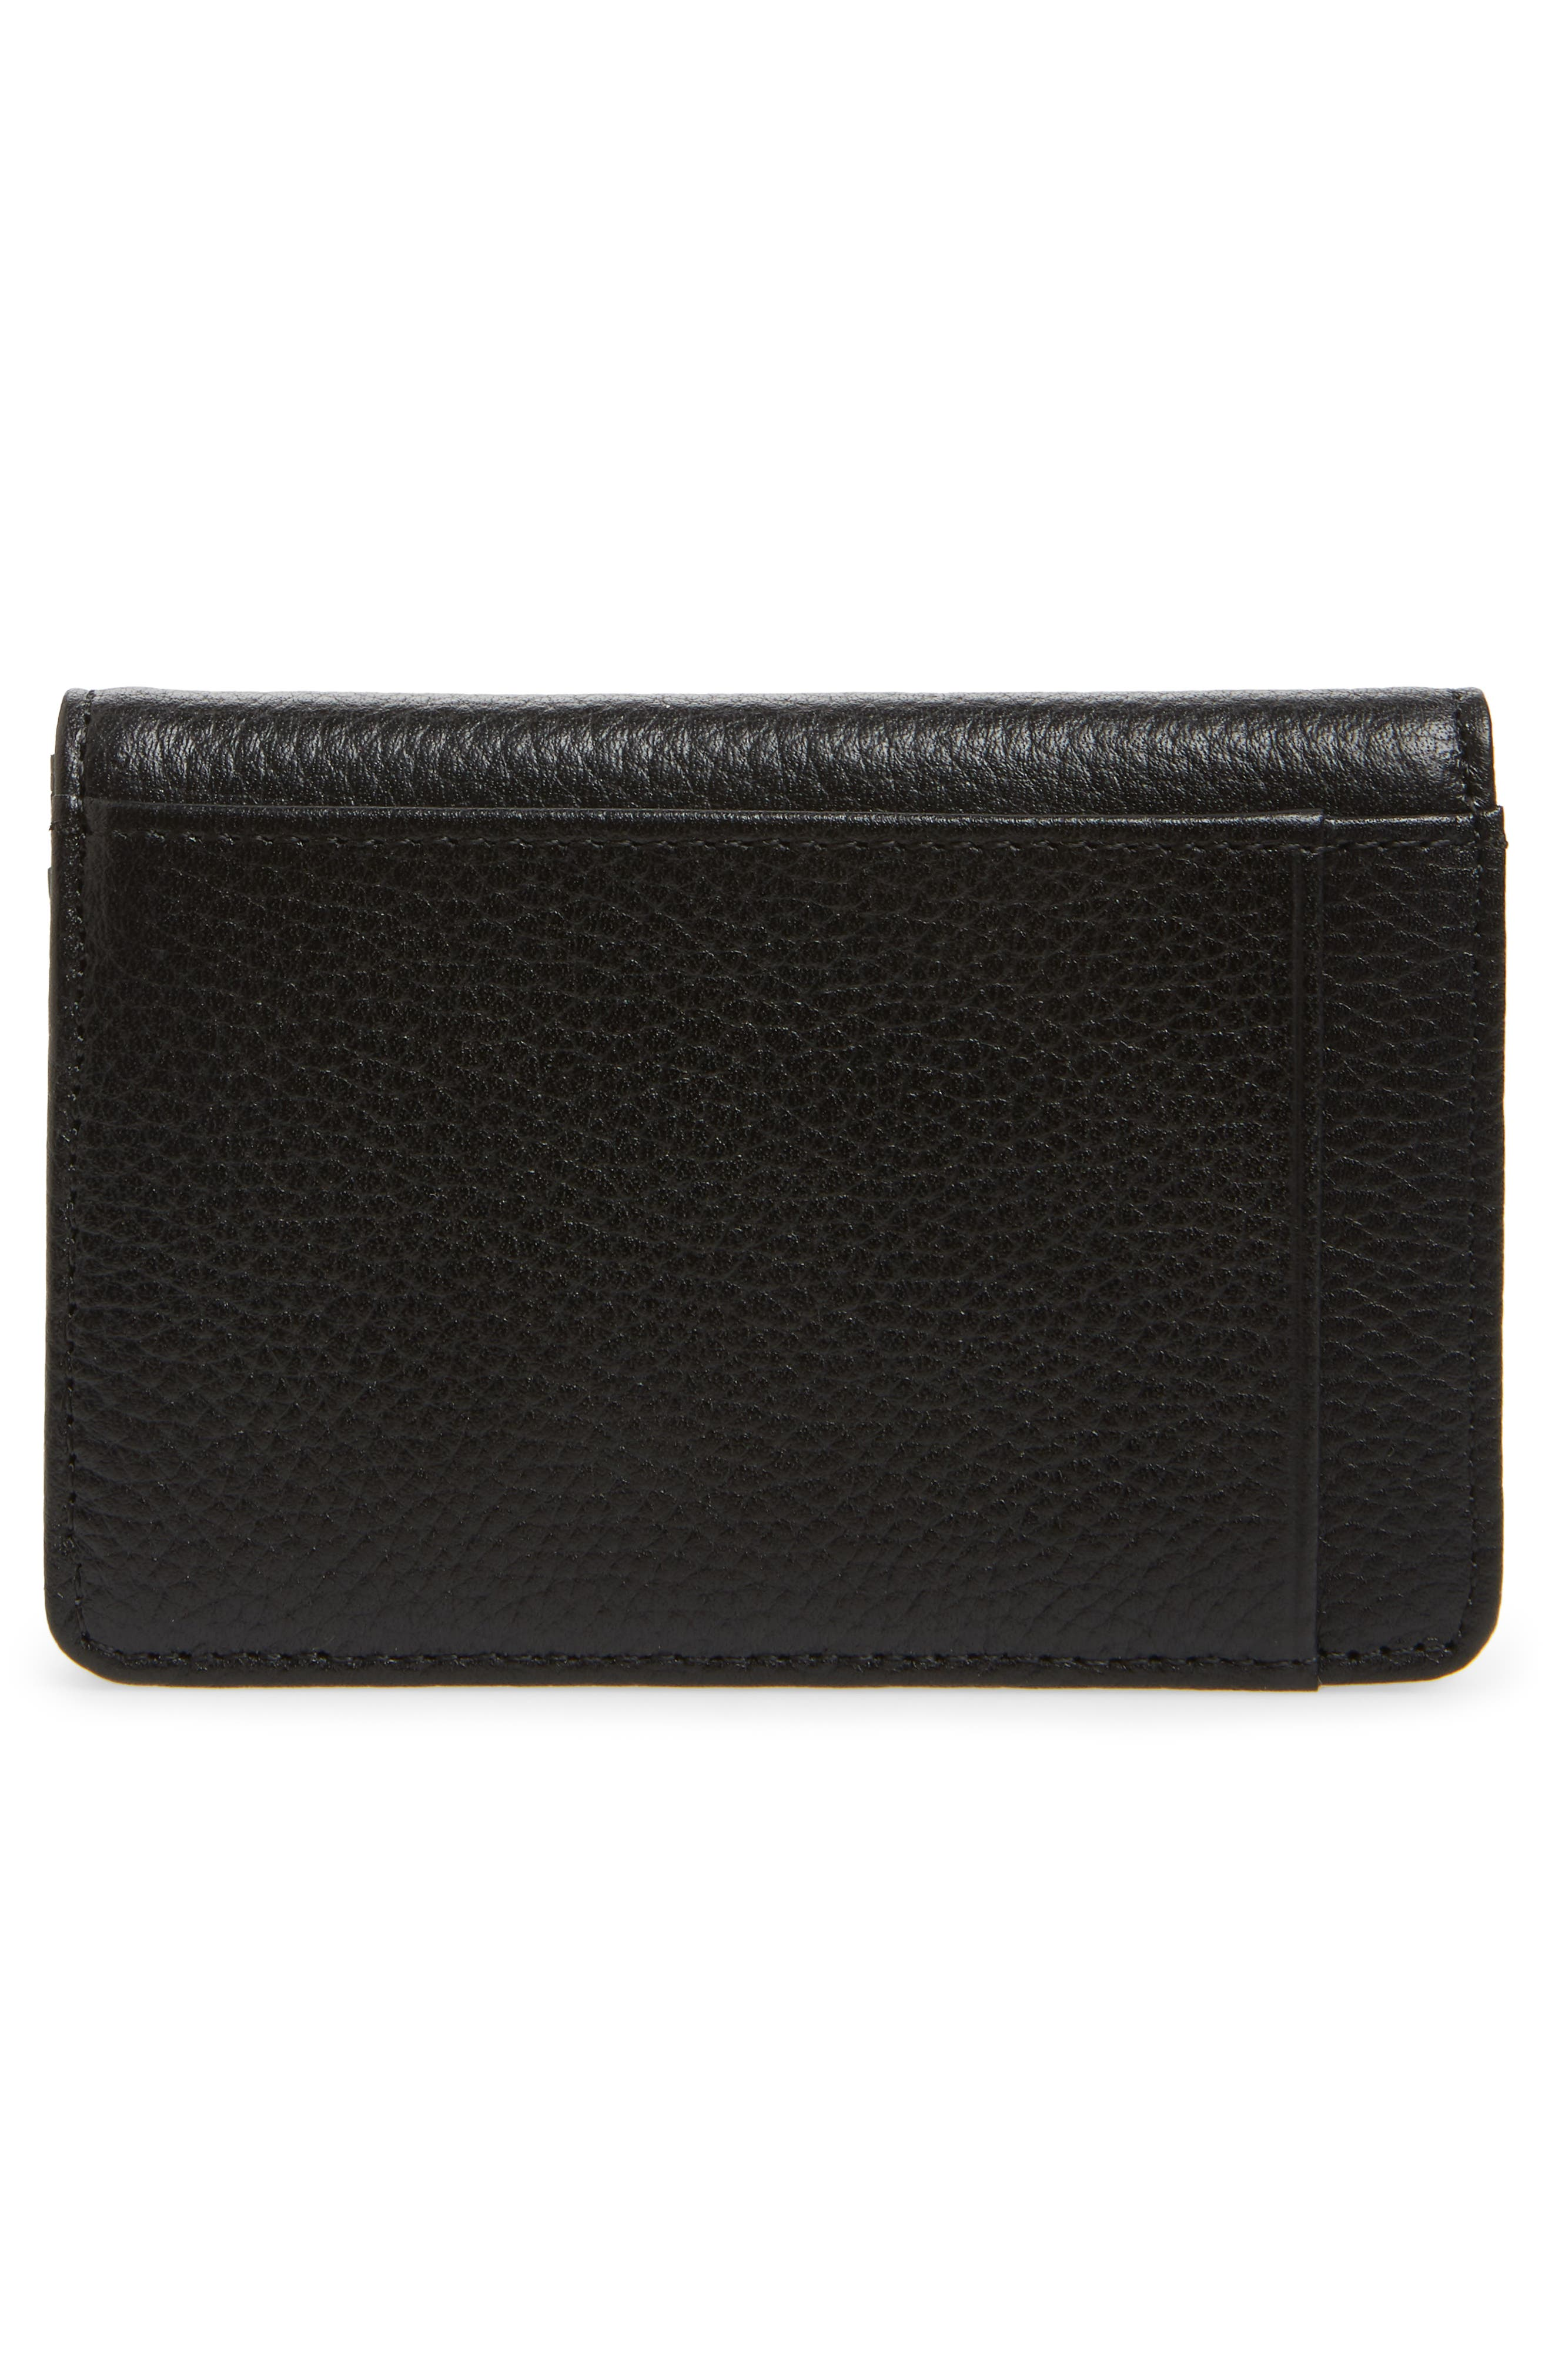 Ruby Pebbled Leather Cardholder,                             Alternate thumbnail 3, color,                             BLACK